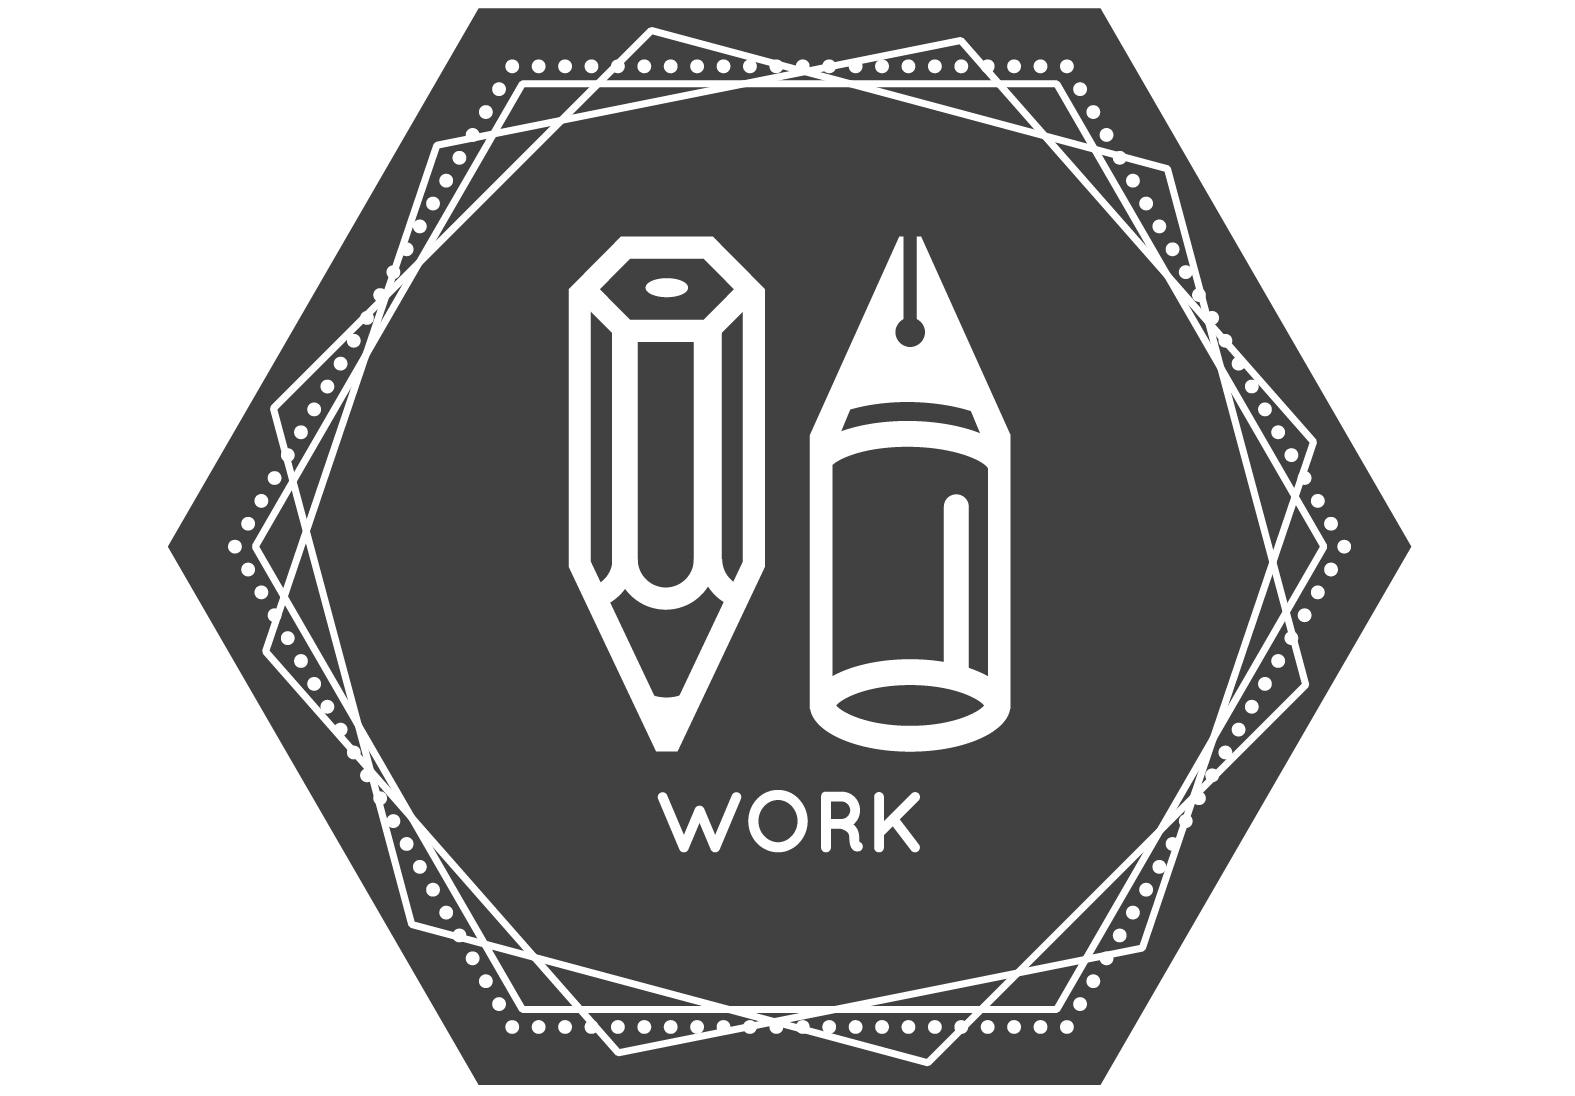 Symbol 1 Work-01-01-01.jpg